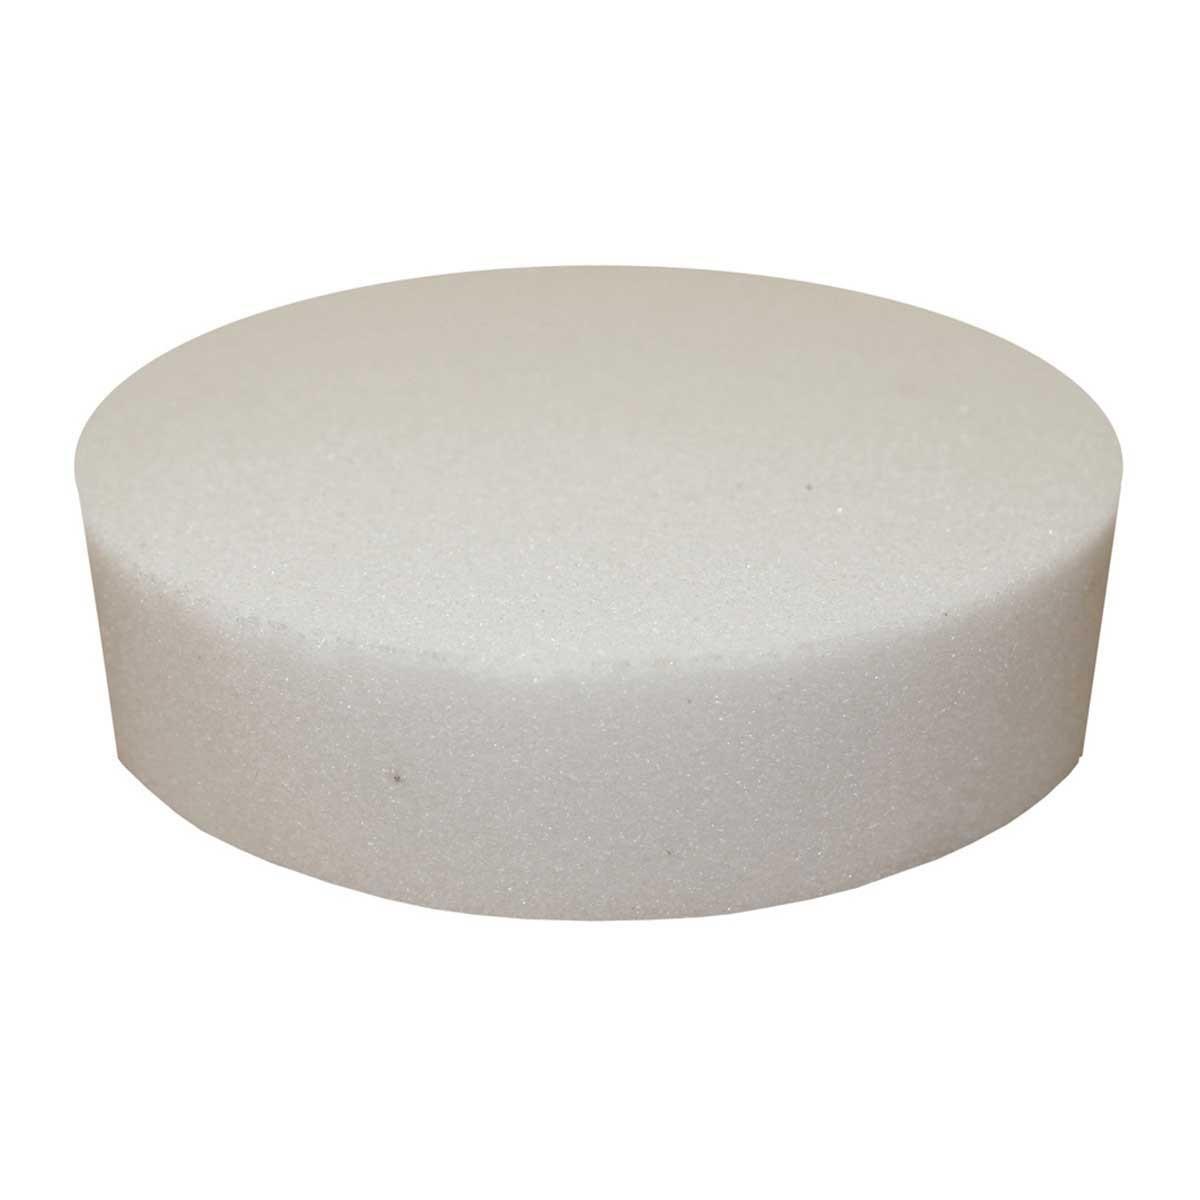 Barwalt 60 grit Rubbing Stone 70502